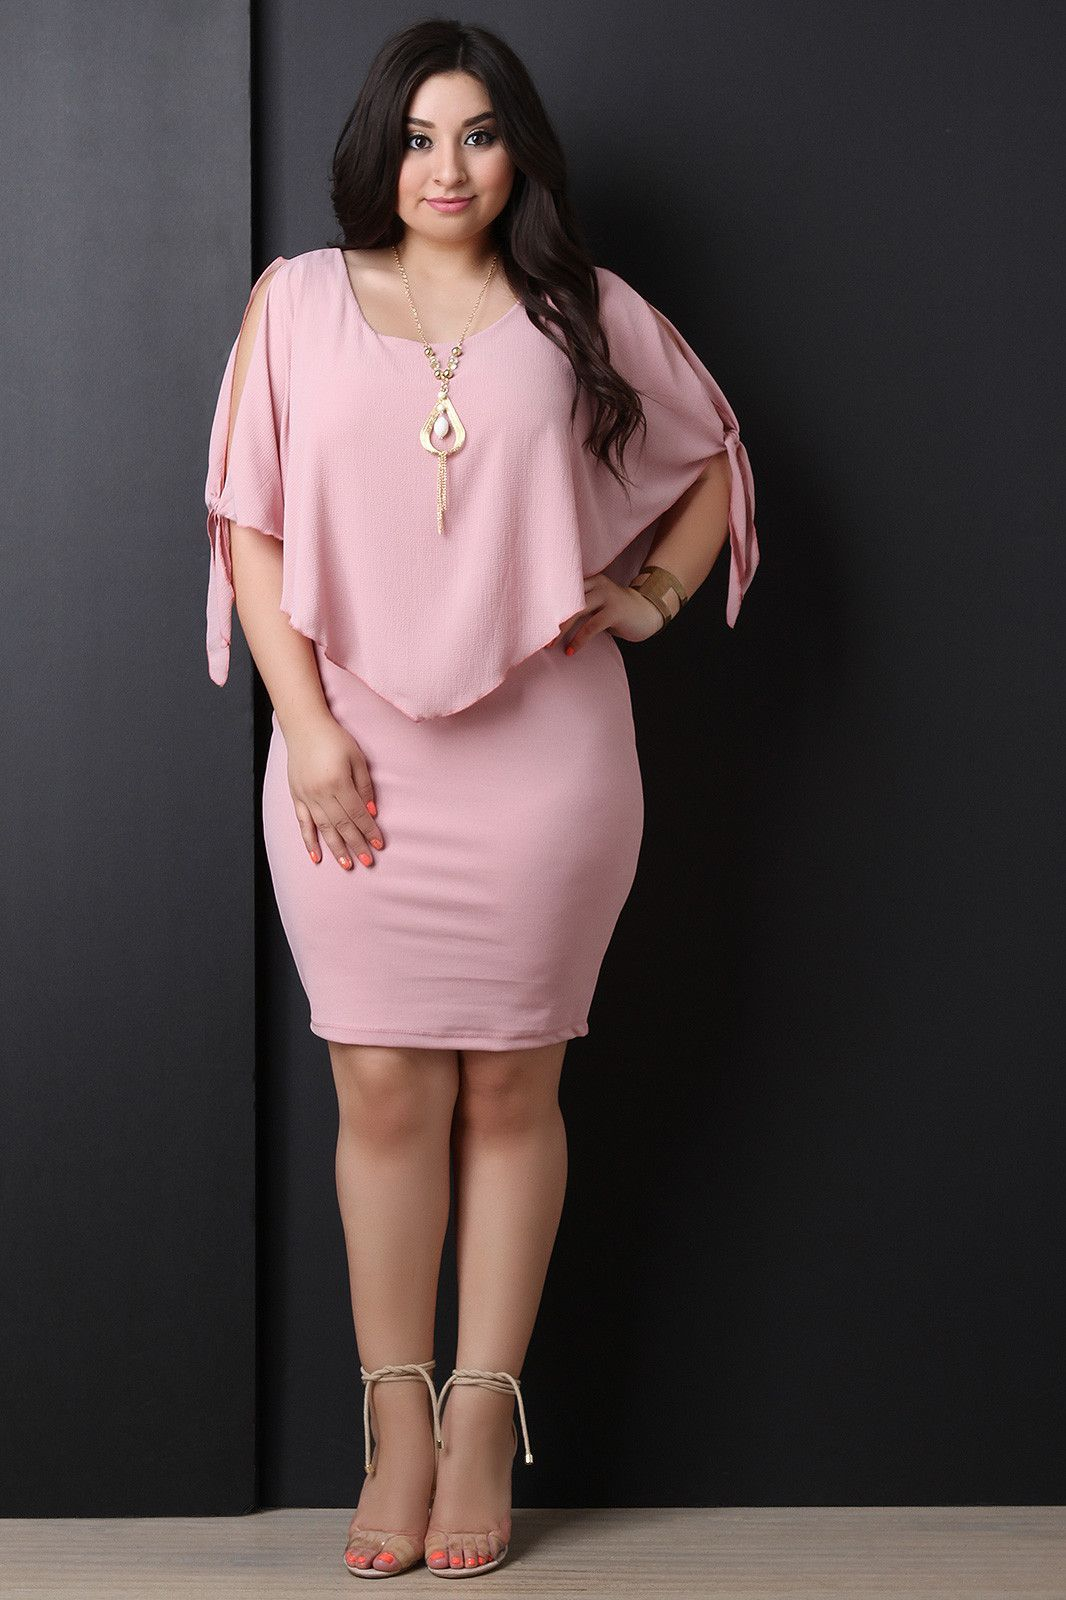 Poncho Self-Tie Sleeve Necklace Midi Dress | Vestidos | Pinterest ...